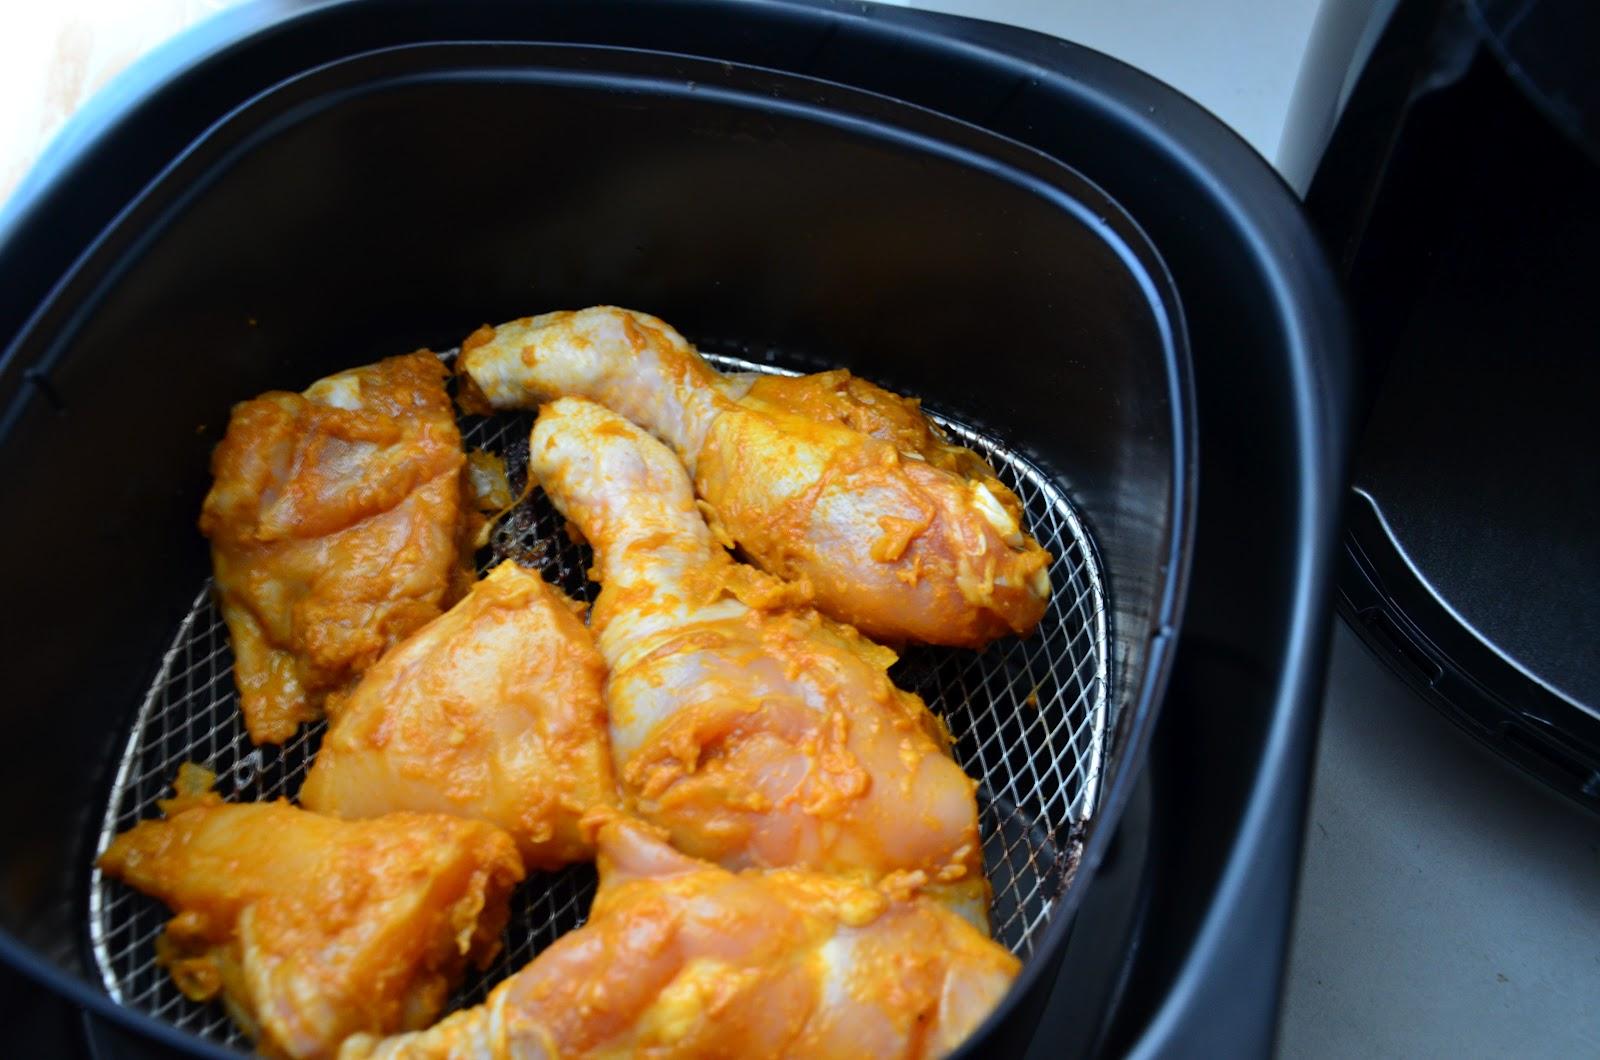 Resepi Ayam Bakar Guna Air Fryer Resepi Book K